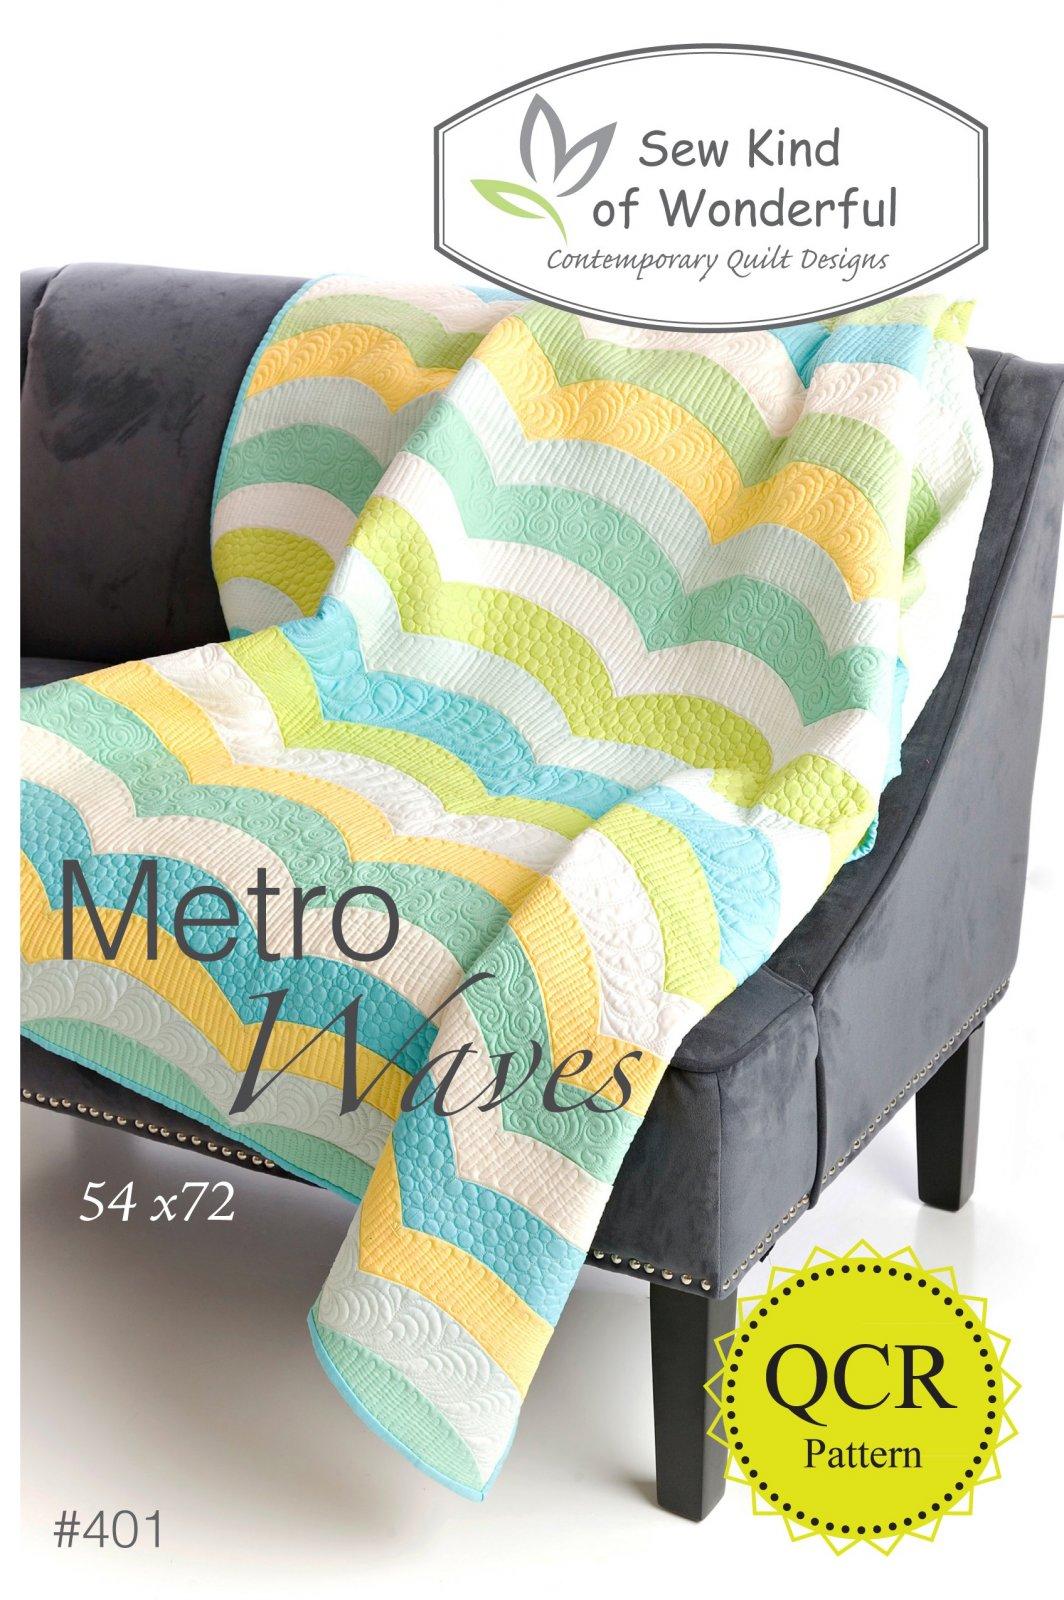 QCR - Metro Waves